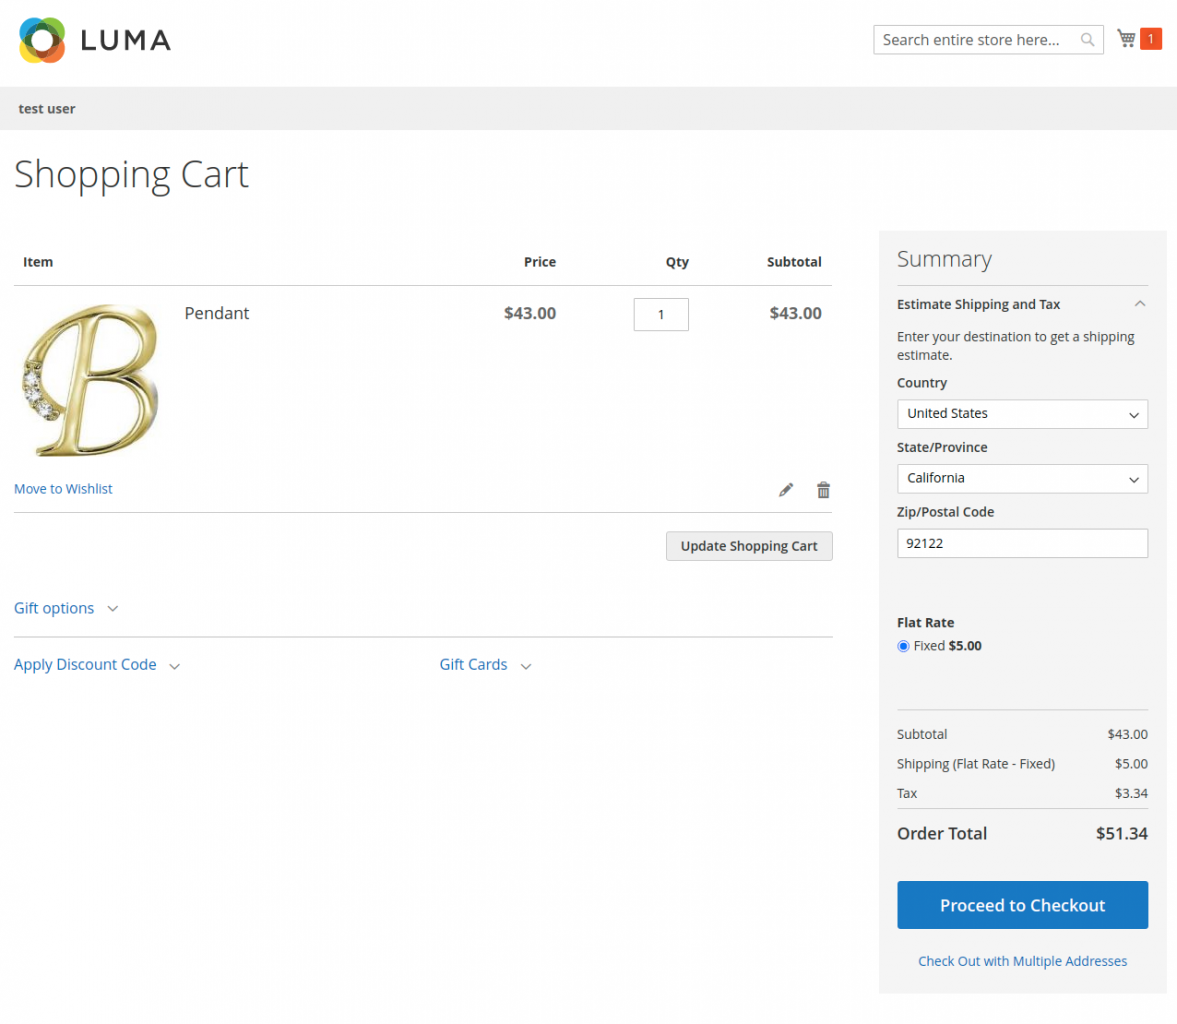 Shopping-Cart-tax-applied